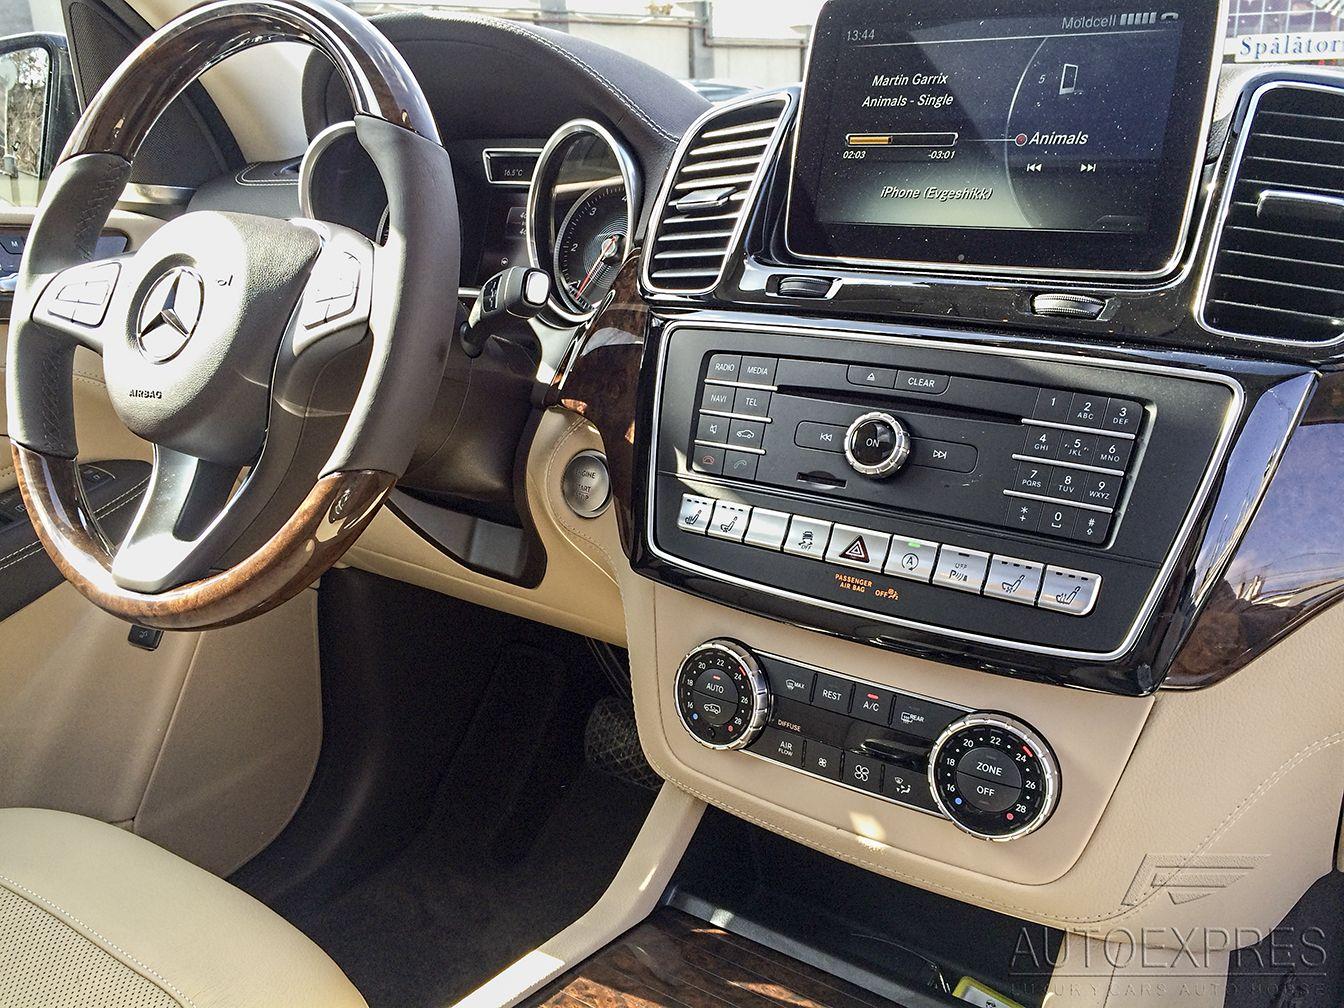 Mercedes Benz Gle 350 D 4matic Mercedes Benz Gle Mercedes Benz